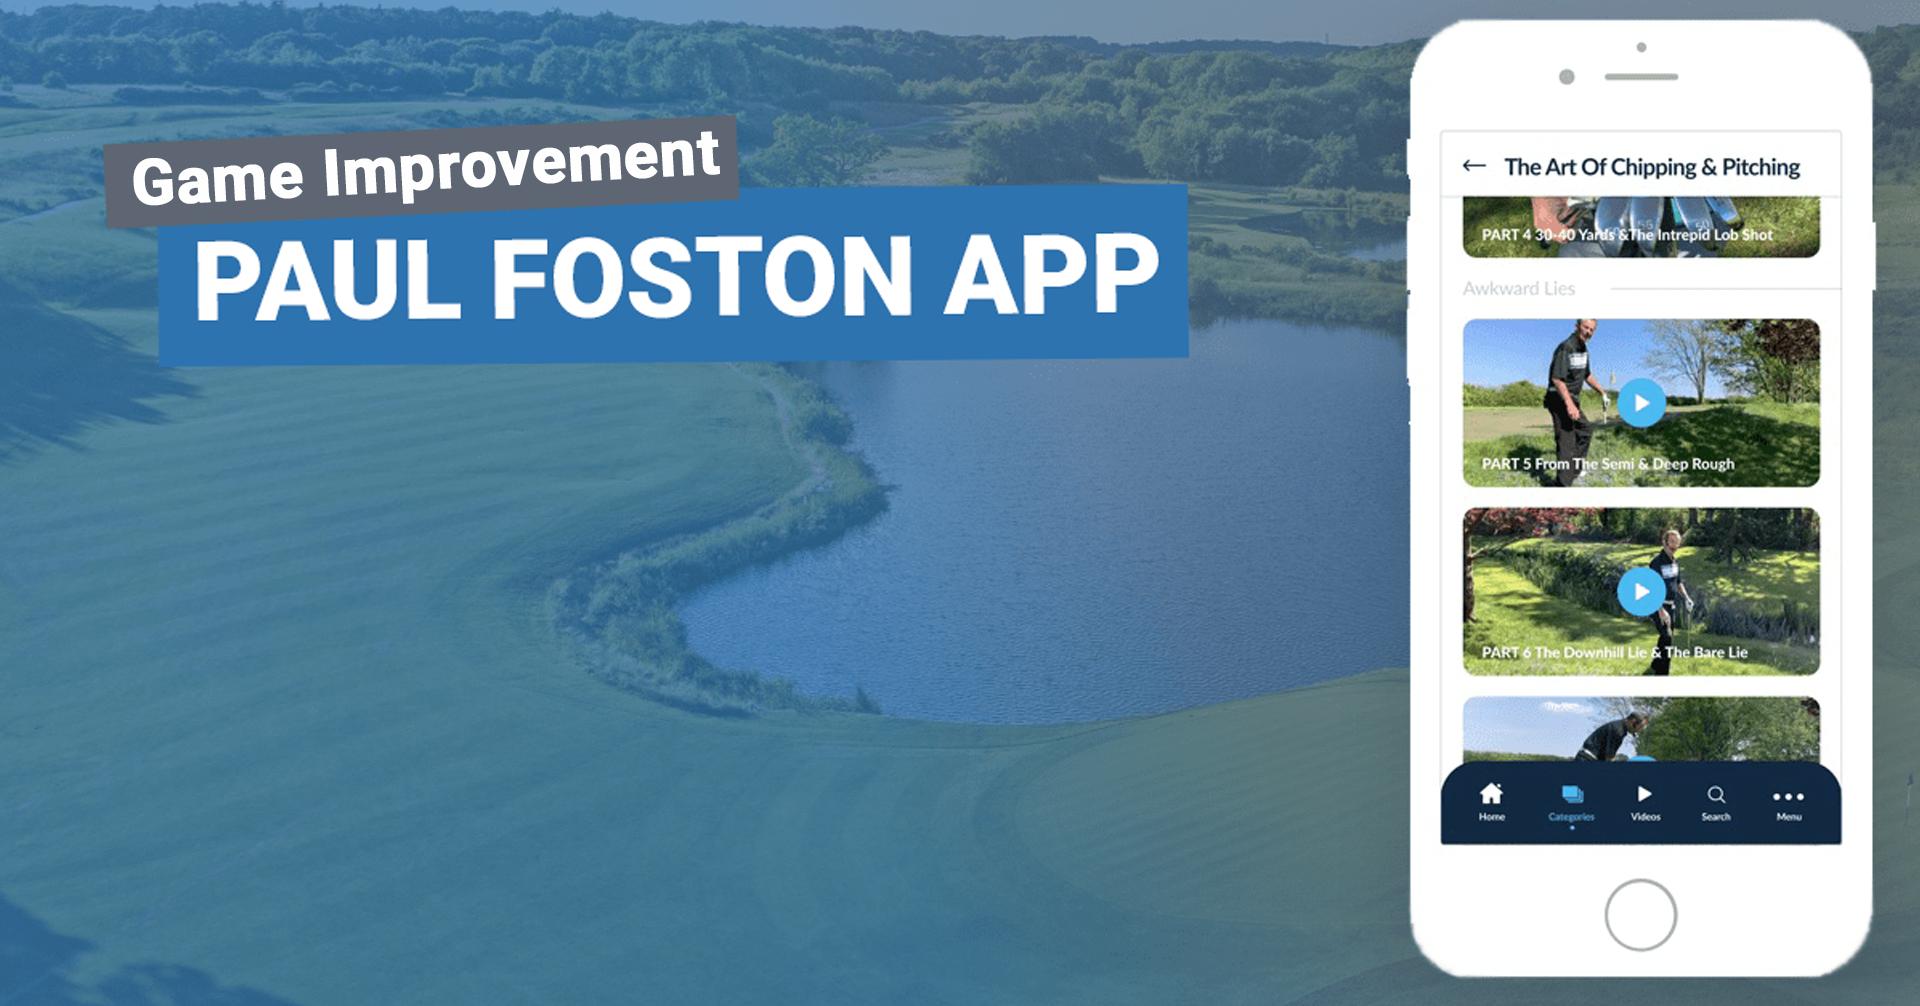 Game Improvement: Paul Foston 'My Golf Masterclass' App